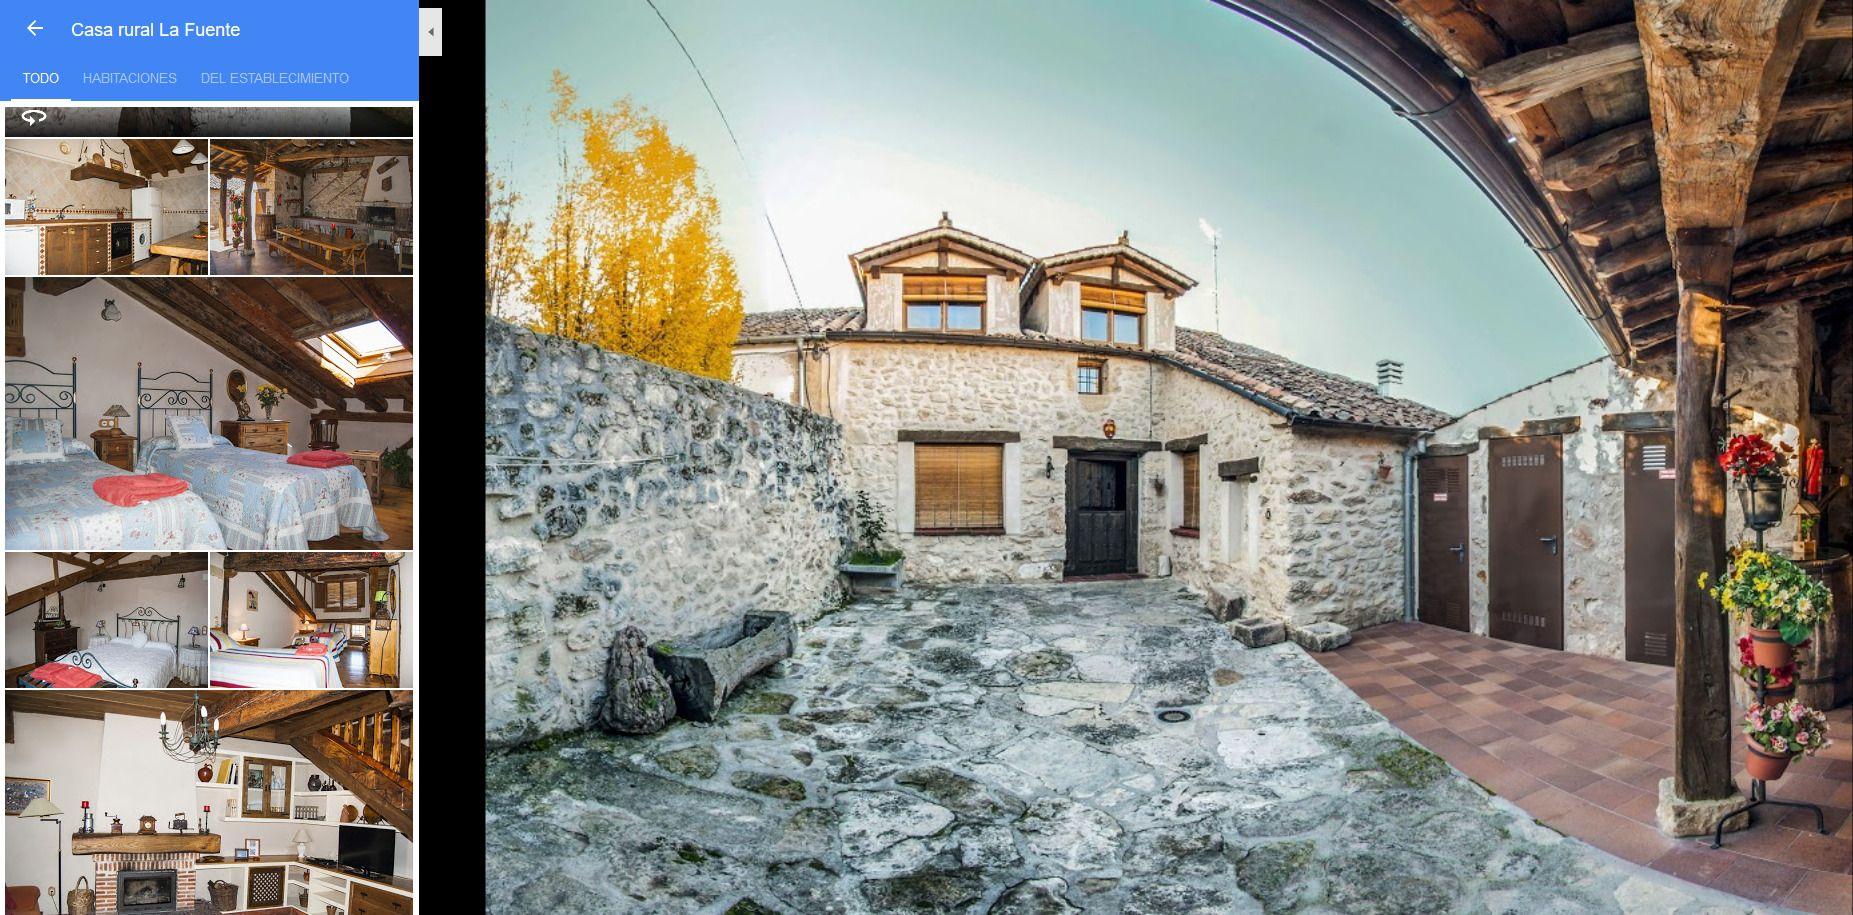 Perfil casa rural Las Fuentes en Google Maps